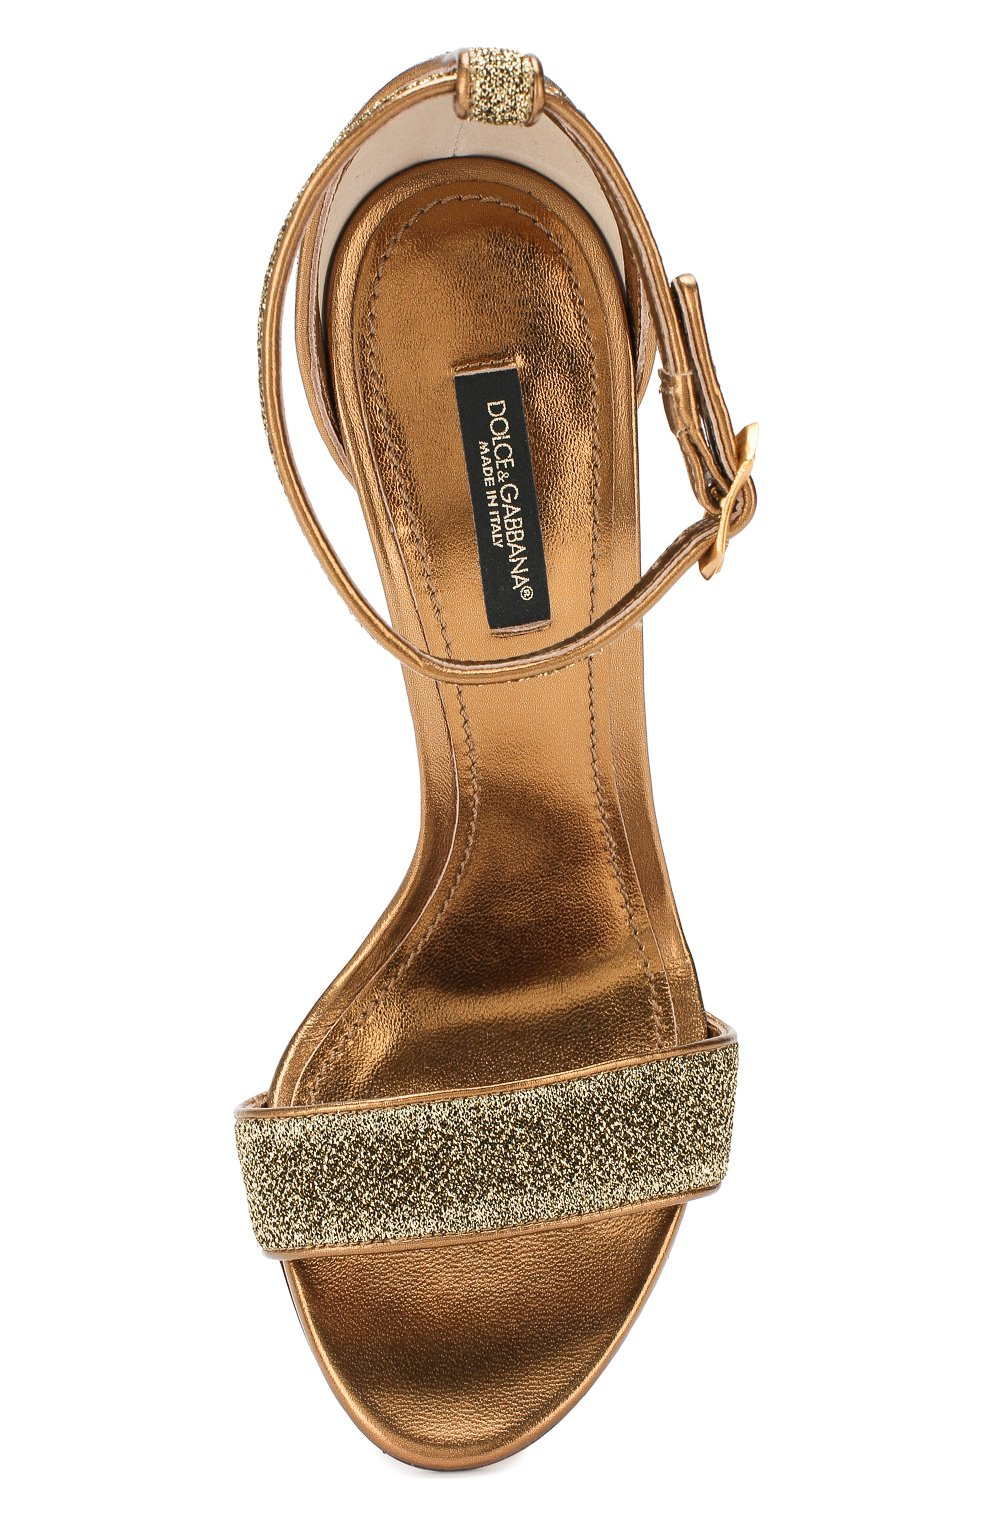 Босоножки Keira Dolce & Gabbana золотые | Фото №5